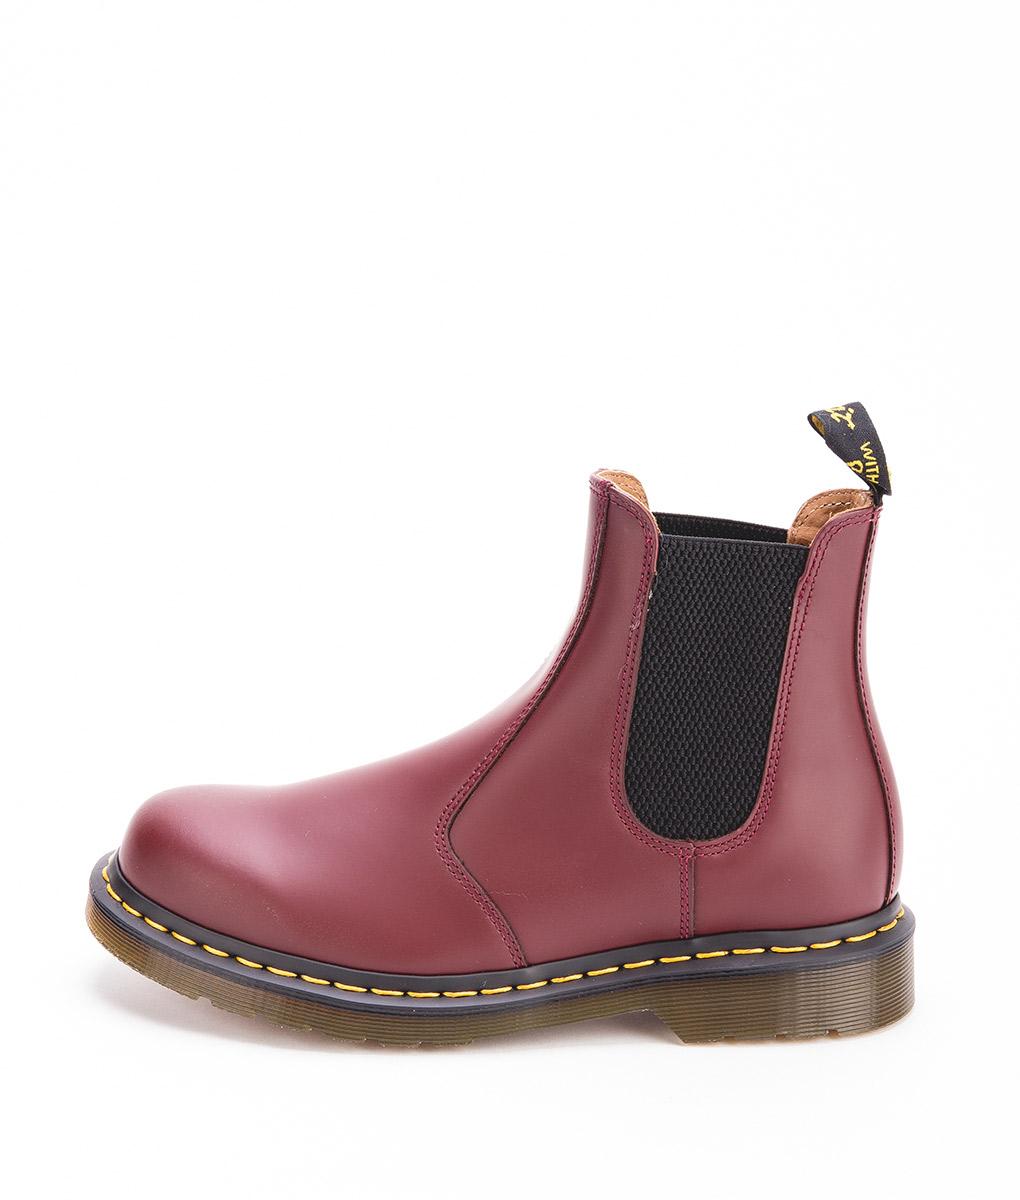 ea720d3b2b946 DR MARTENS Women Chelsea Boots 2976 22227600